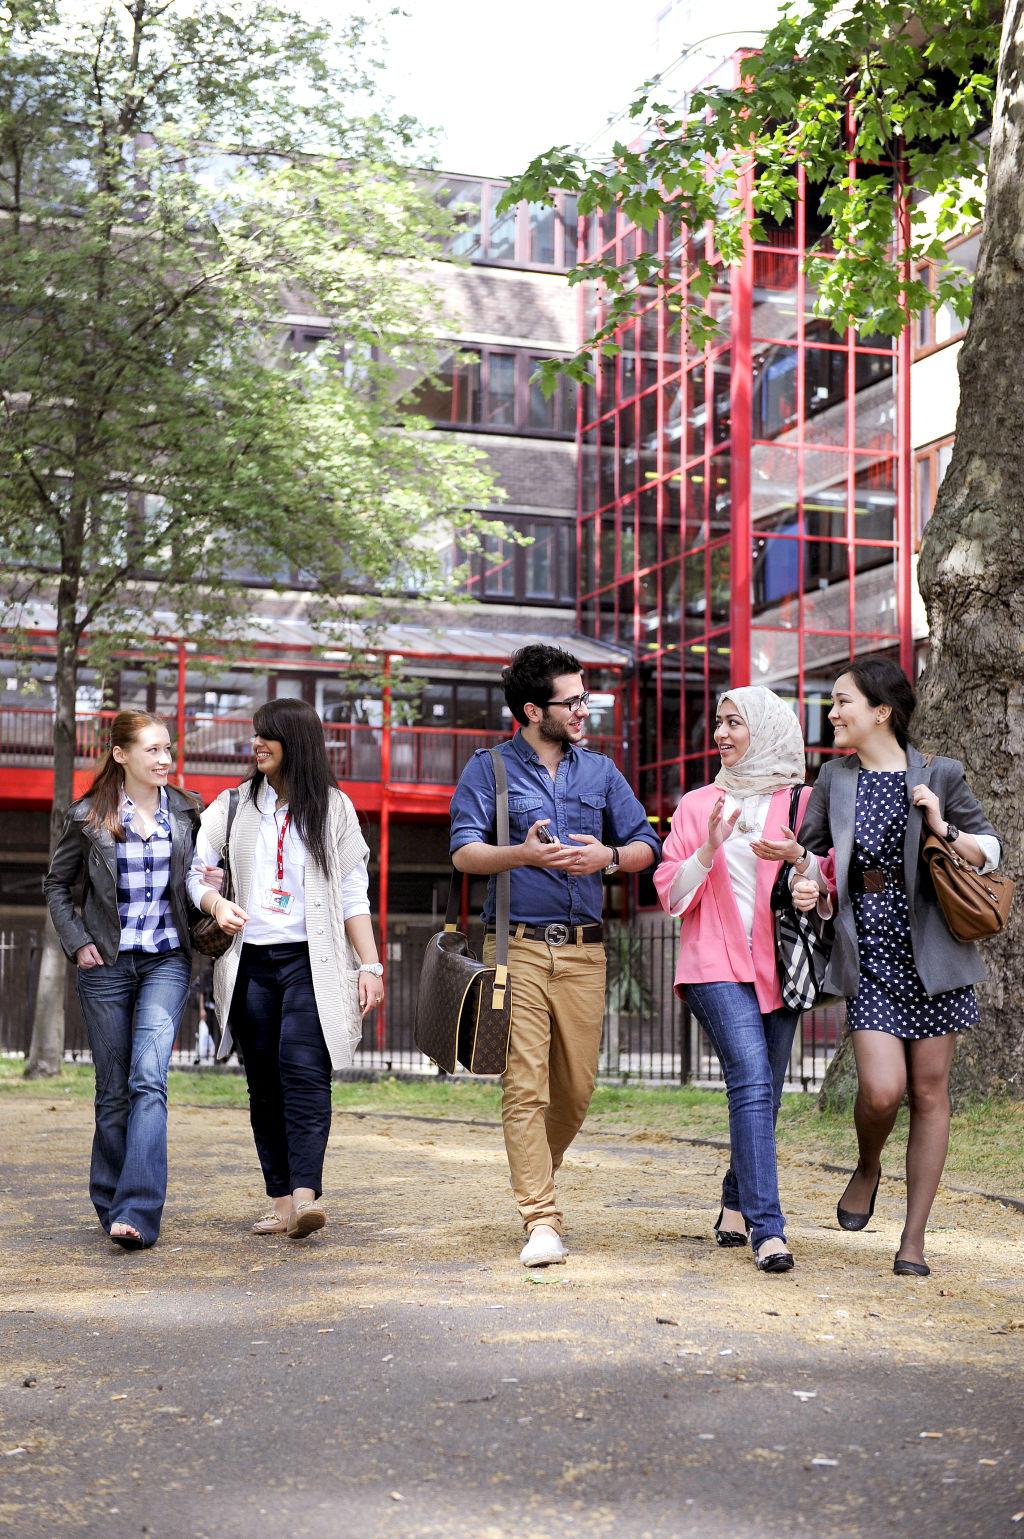 Students walking outside City, University of London